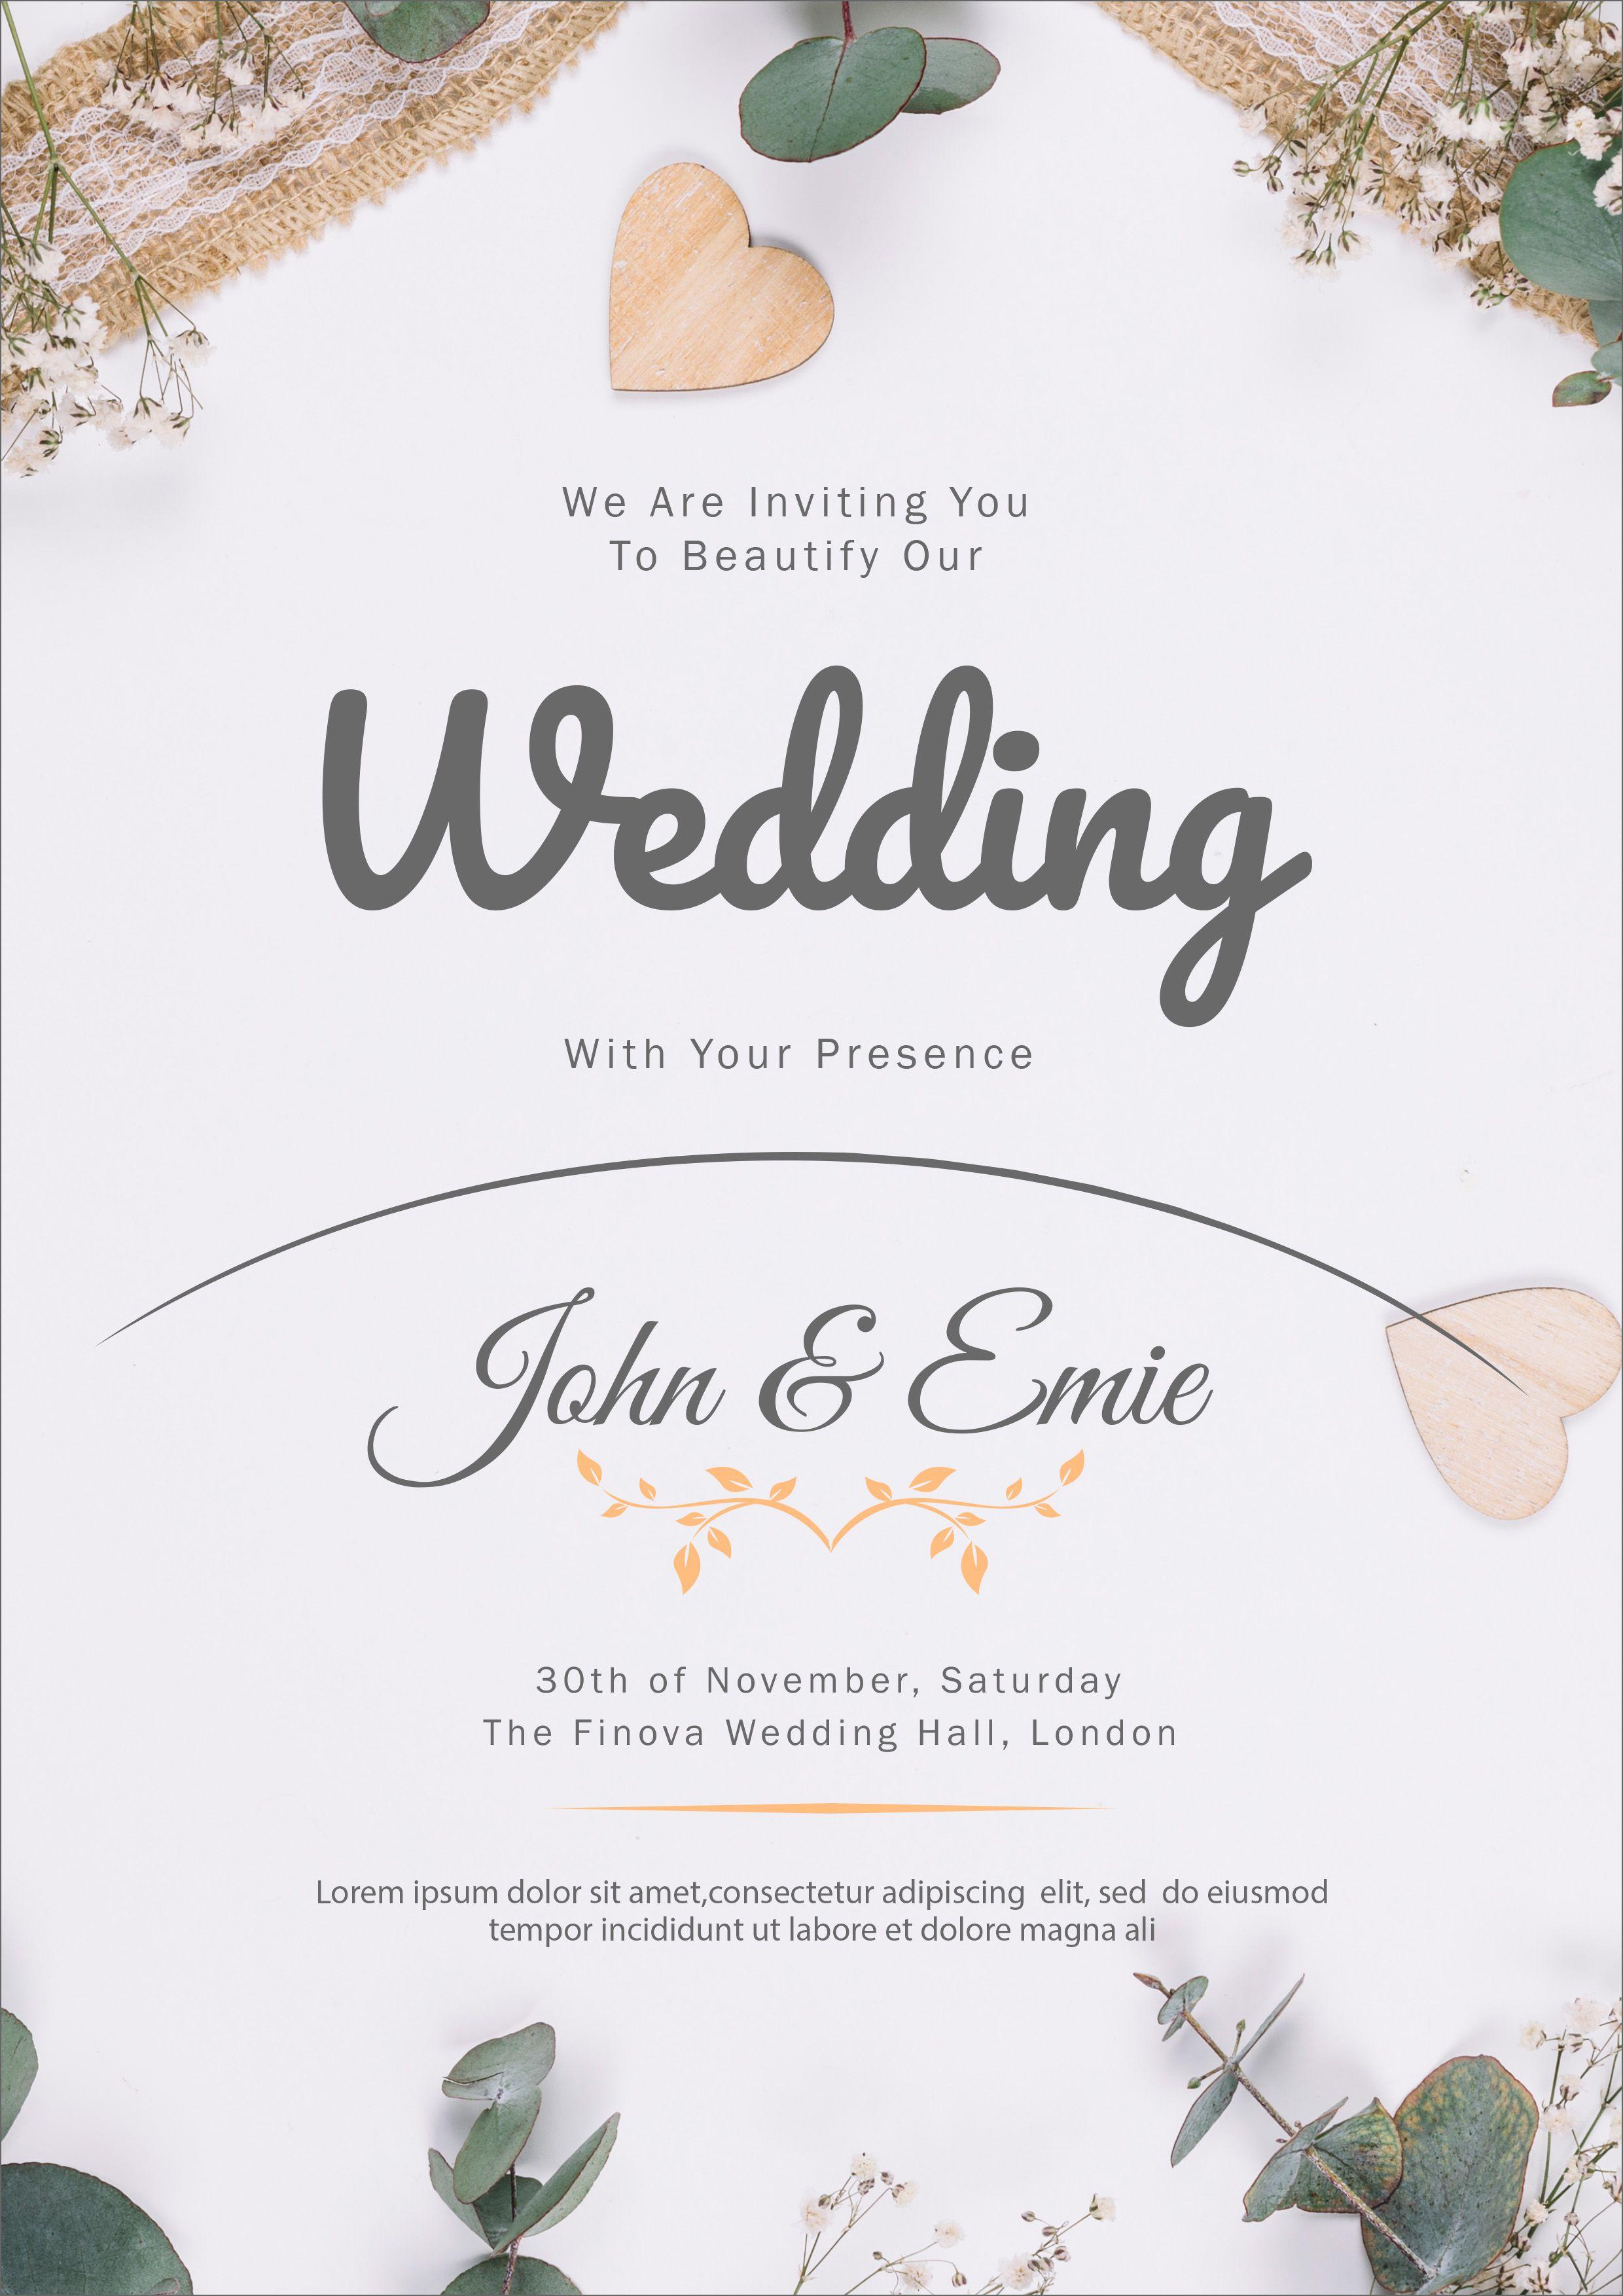 009 Top Sample Wedding Invitation Template High Resolution  Templates Wording CardFull